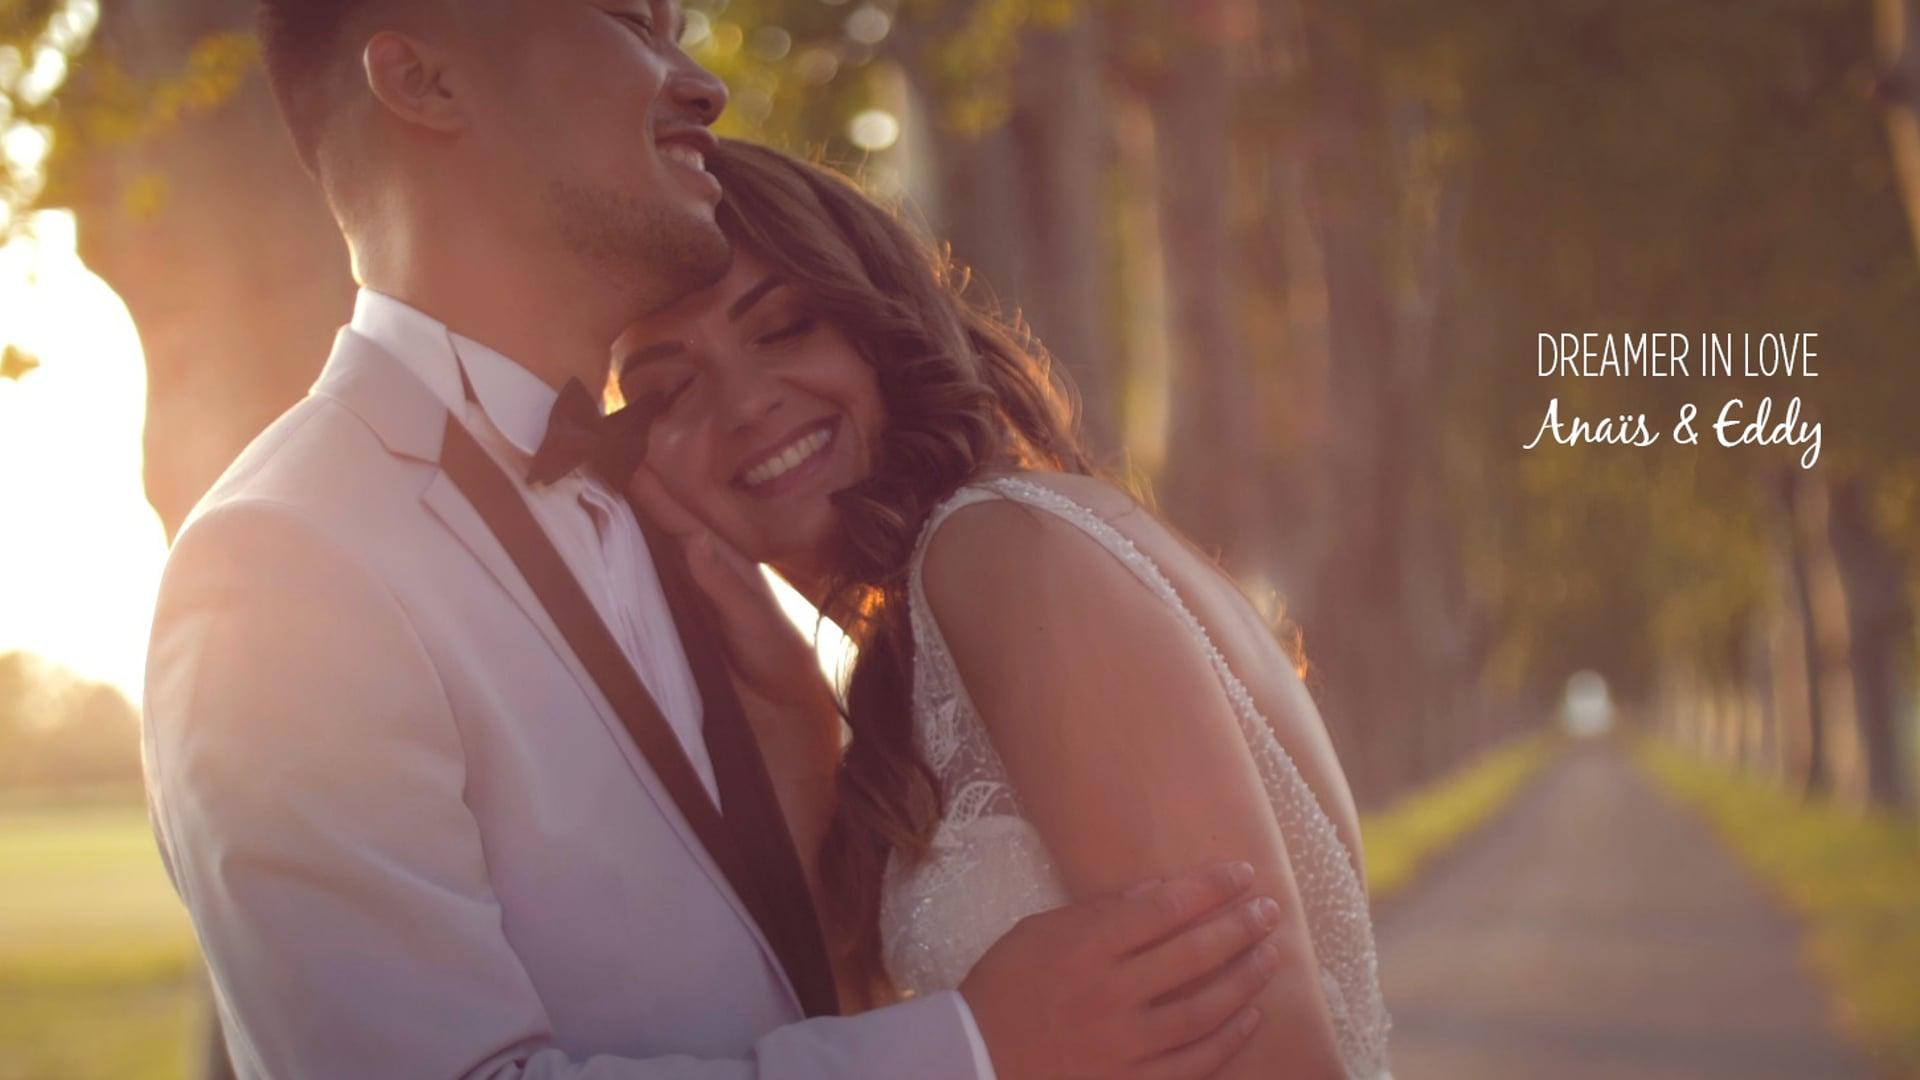 Film mariage Anaïs et Eddy